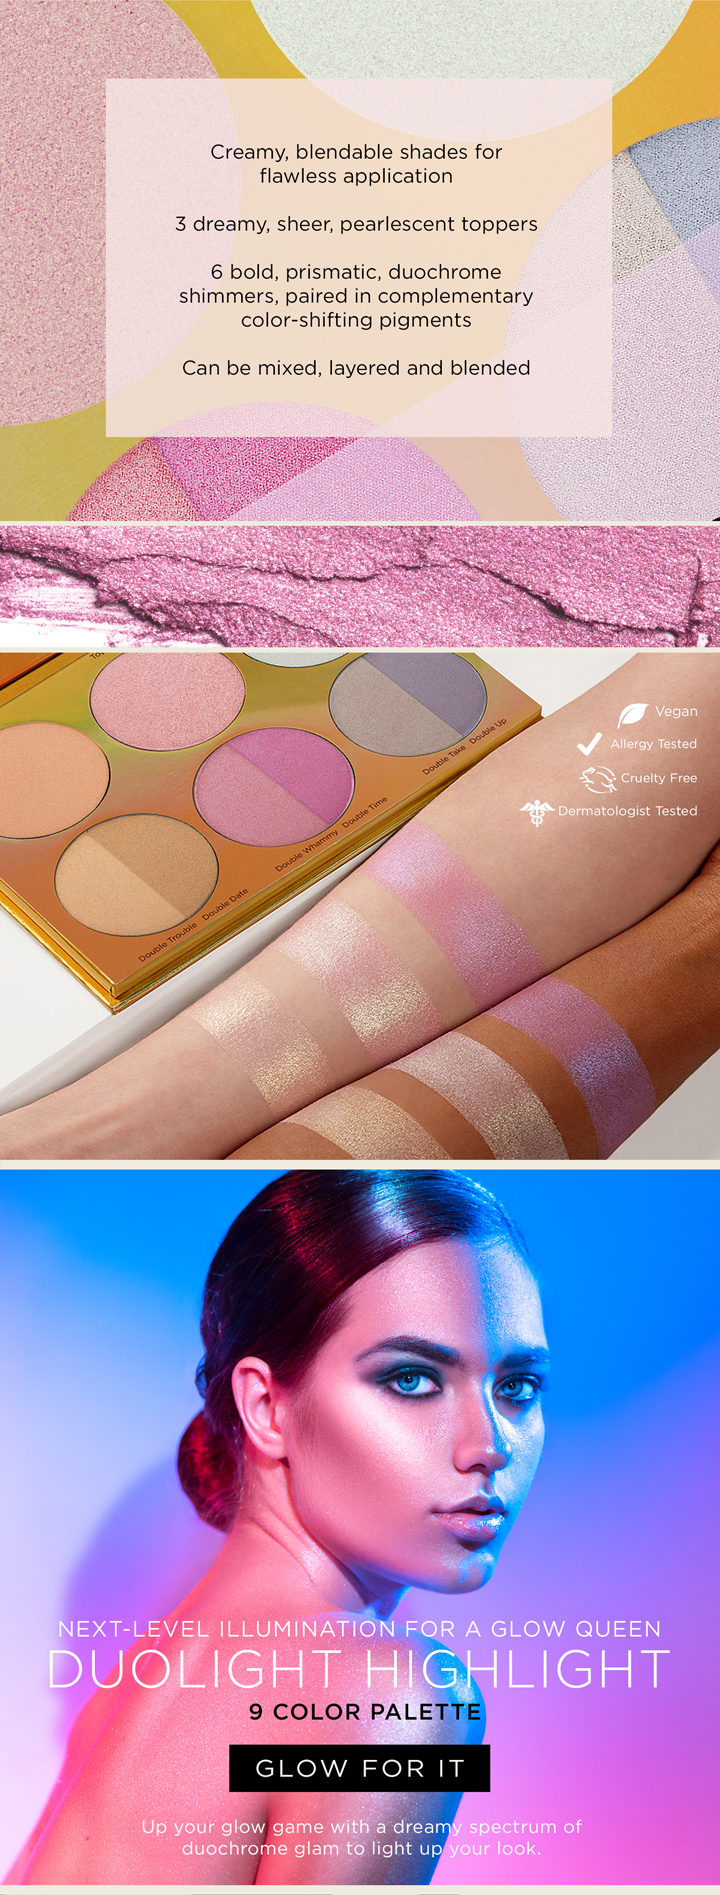 Duolight Highlight Palette by BH Cosmetics #13